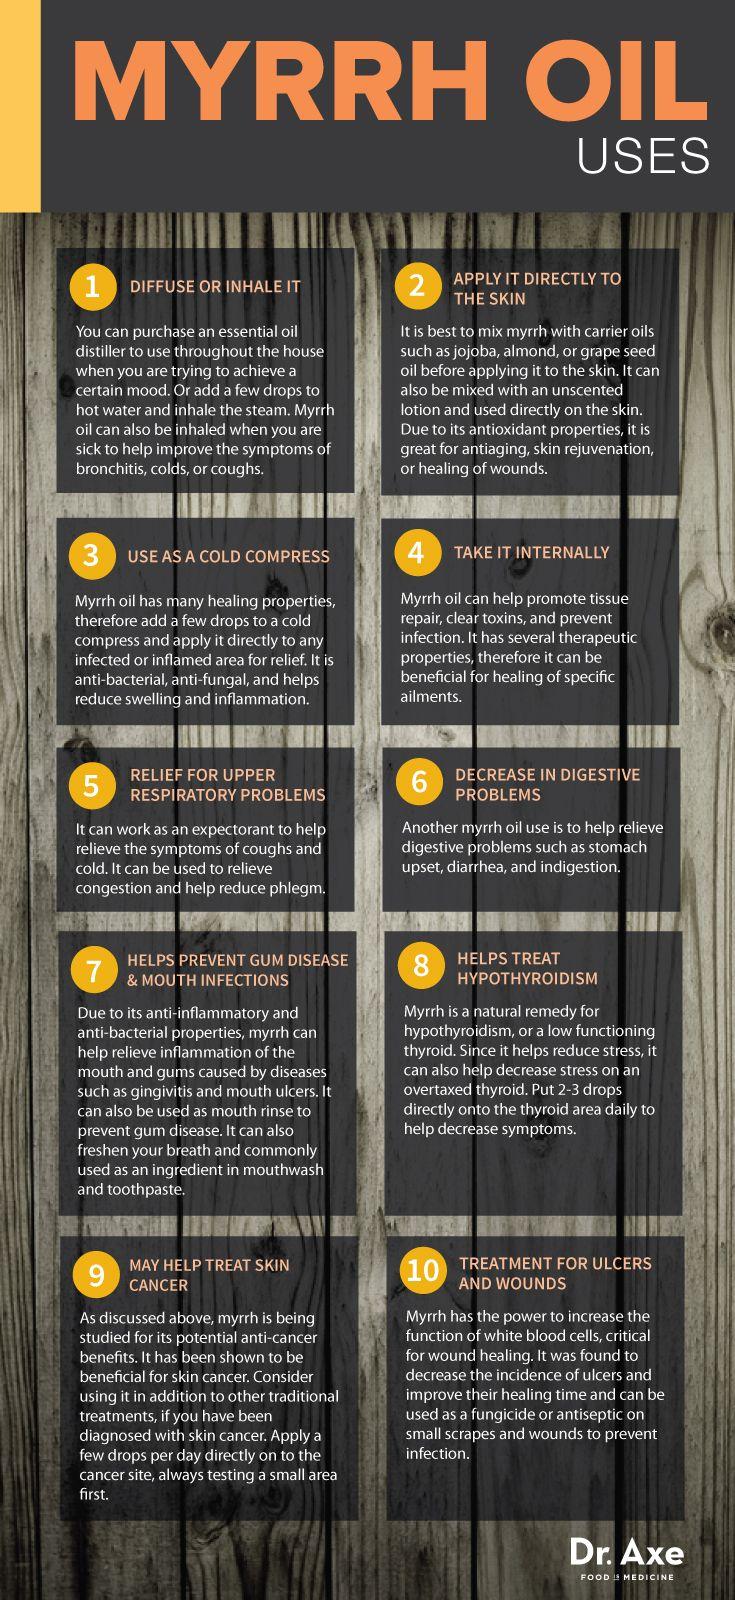 10 Proven Myrrh Oil Benefits & Uses